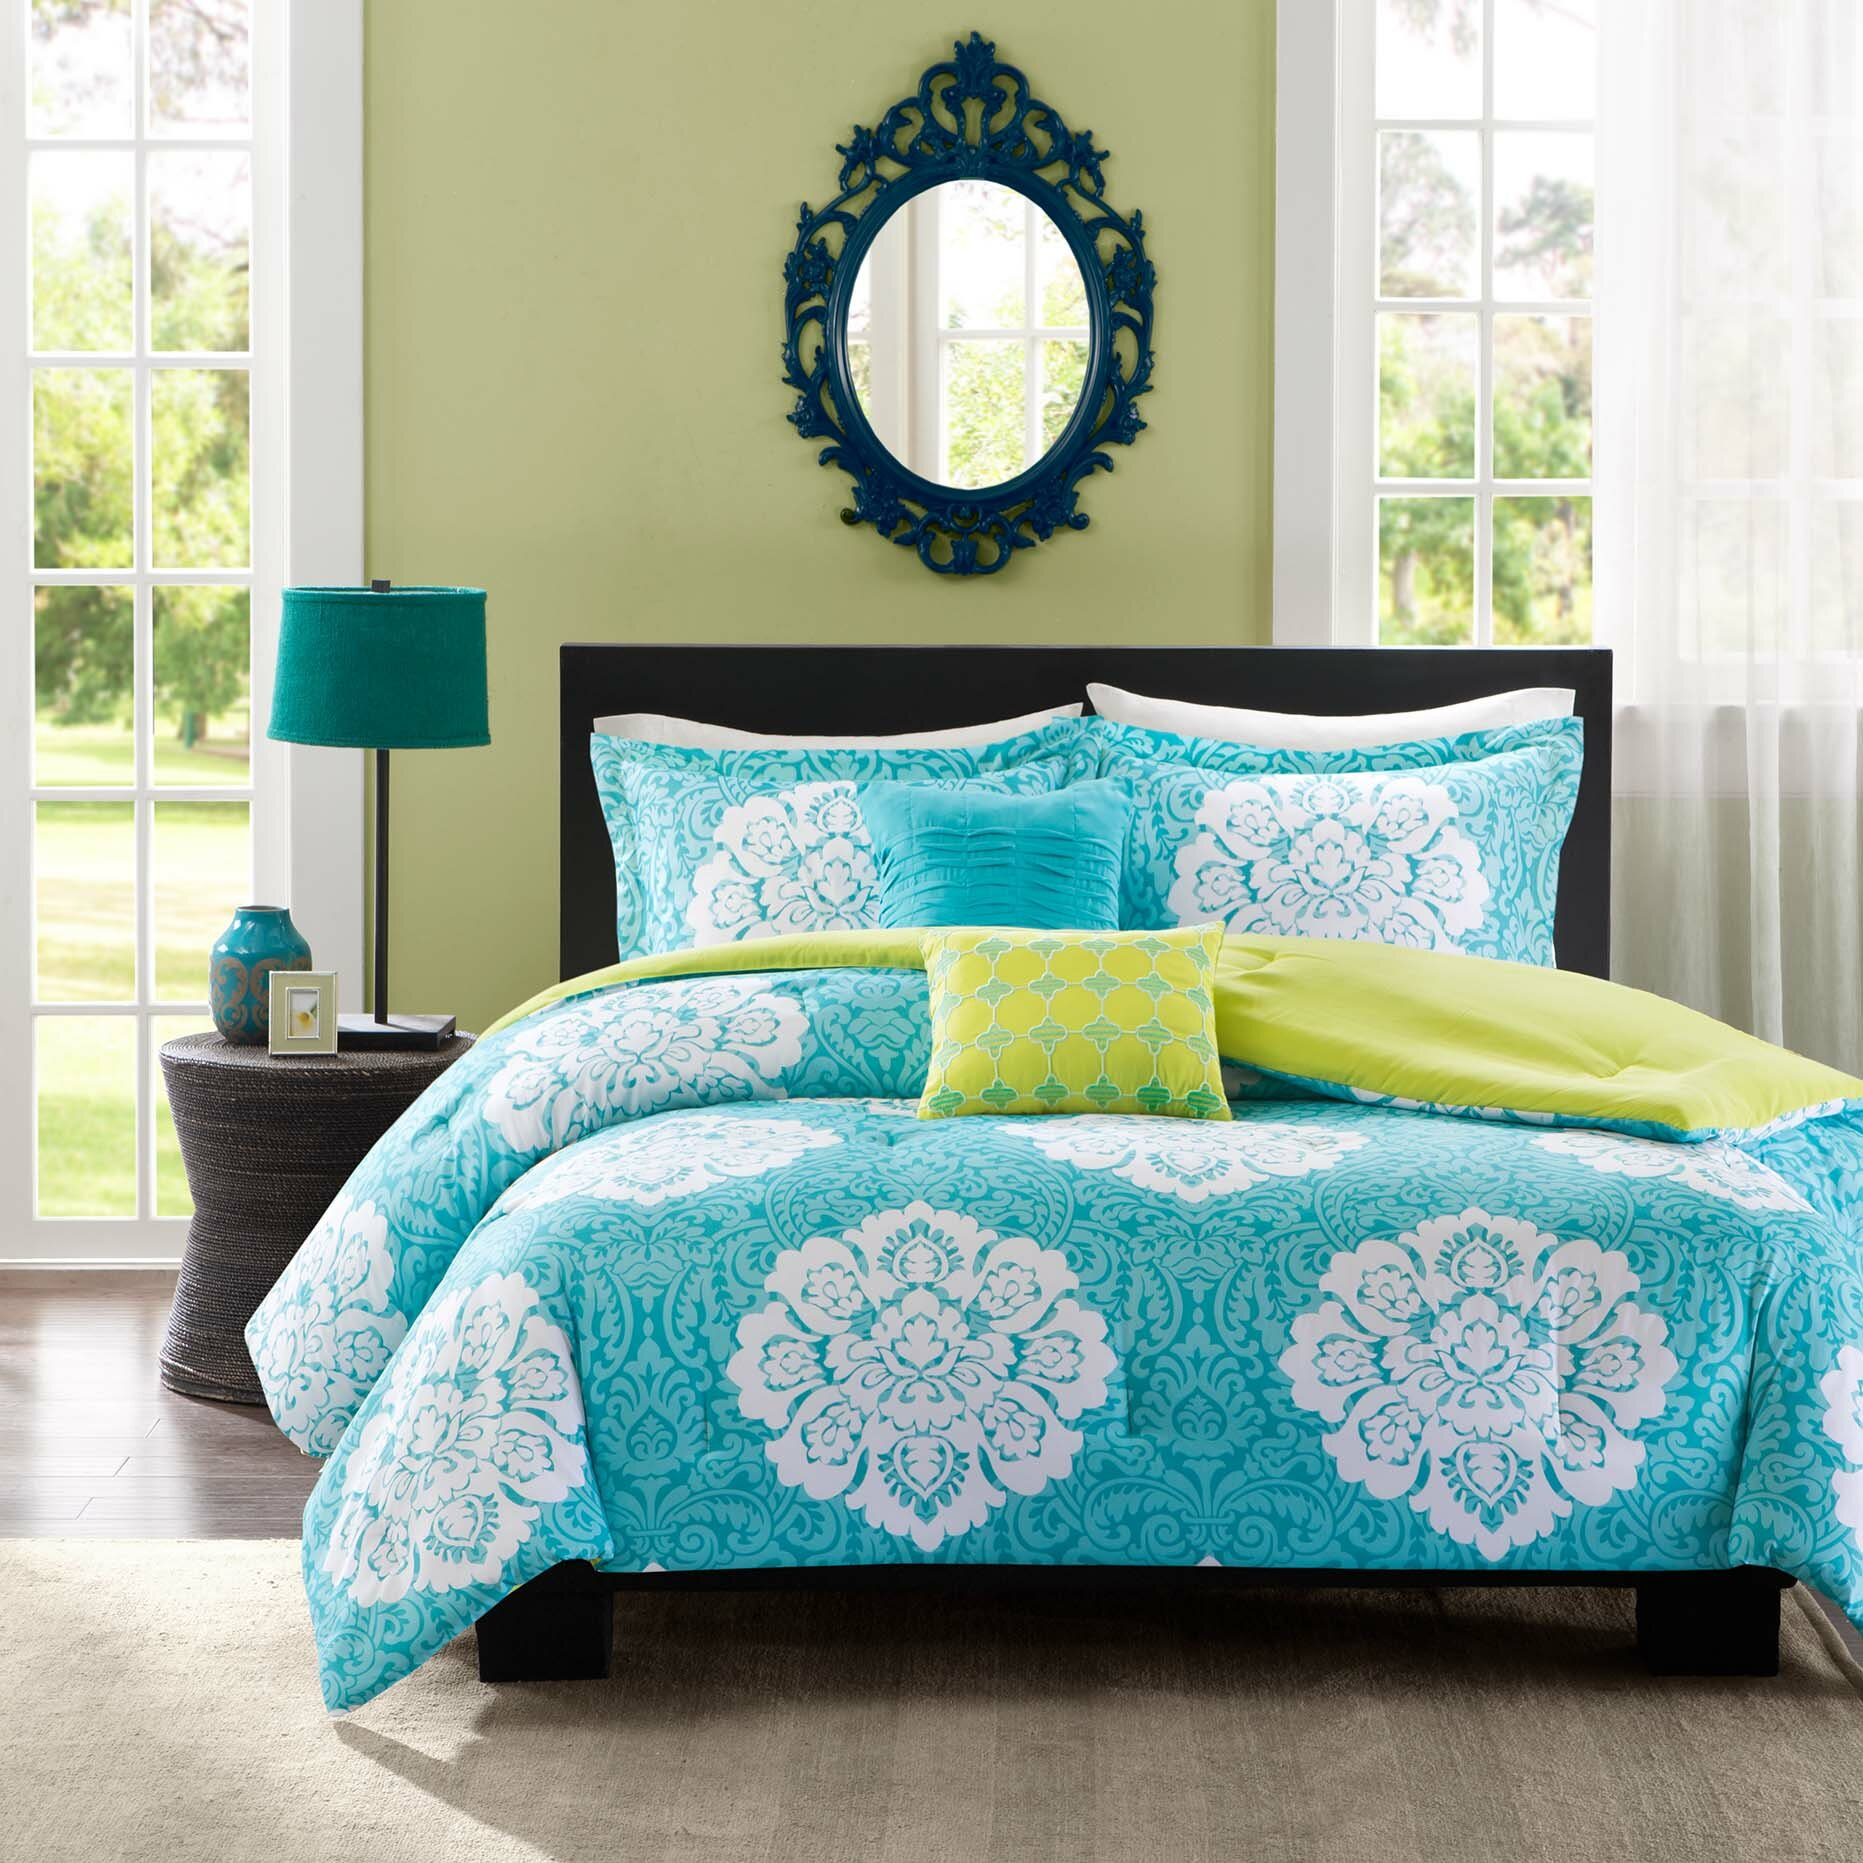 Cali King Bedding Comforter Sets